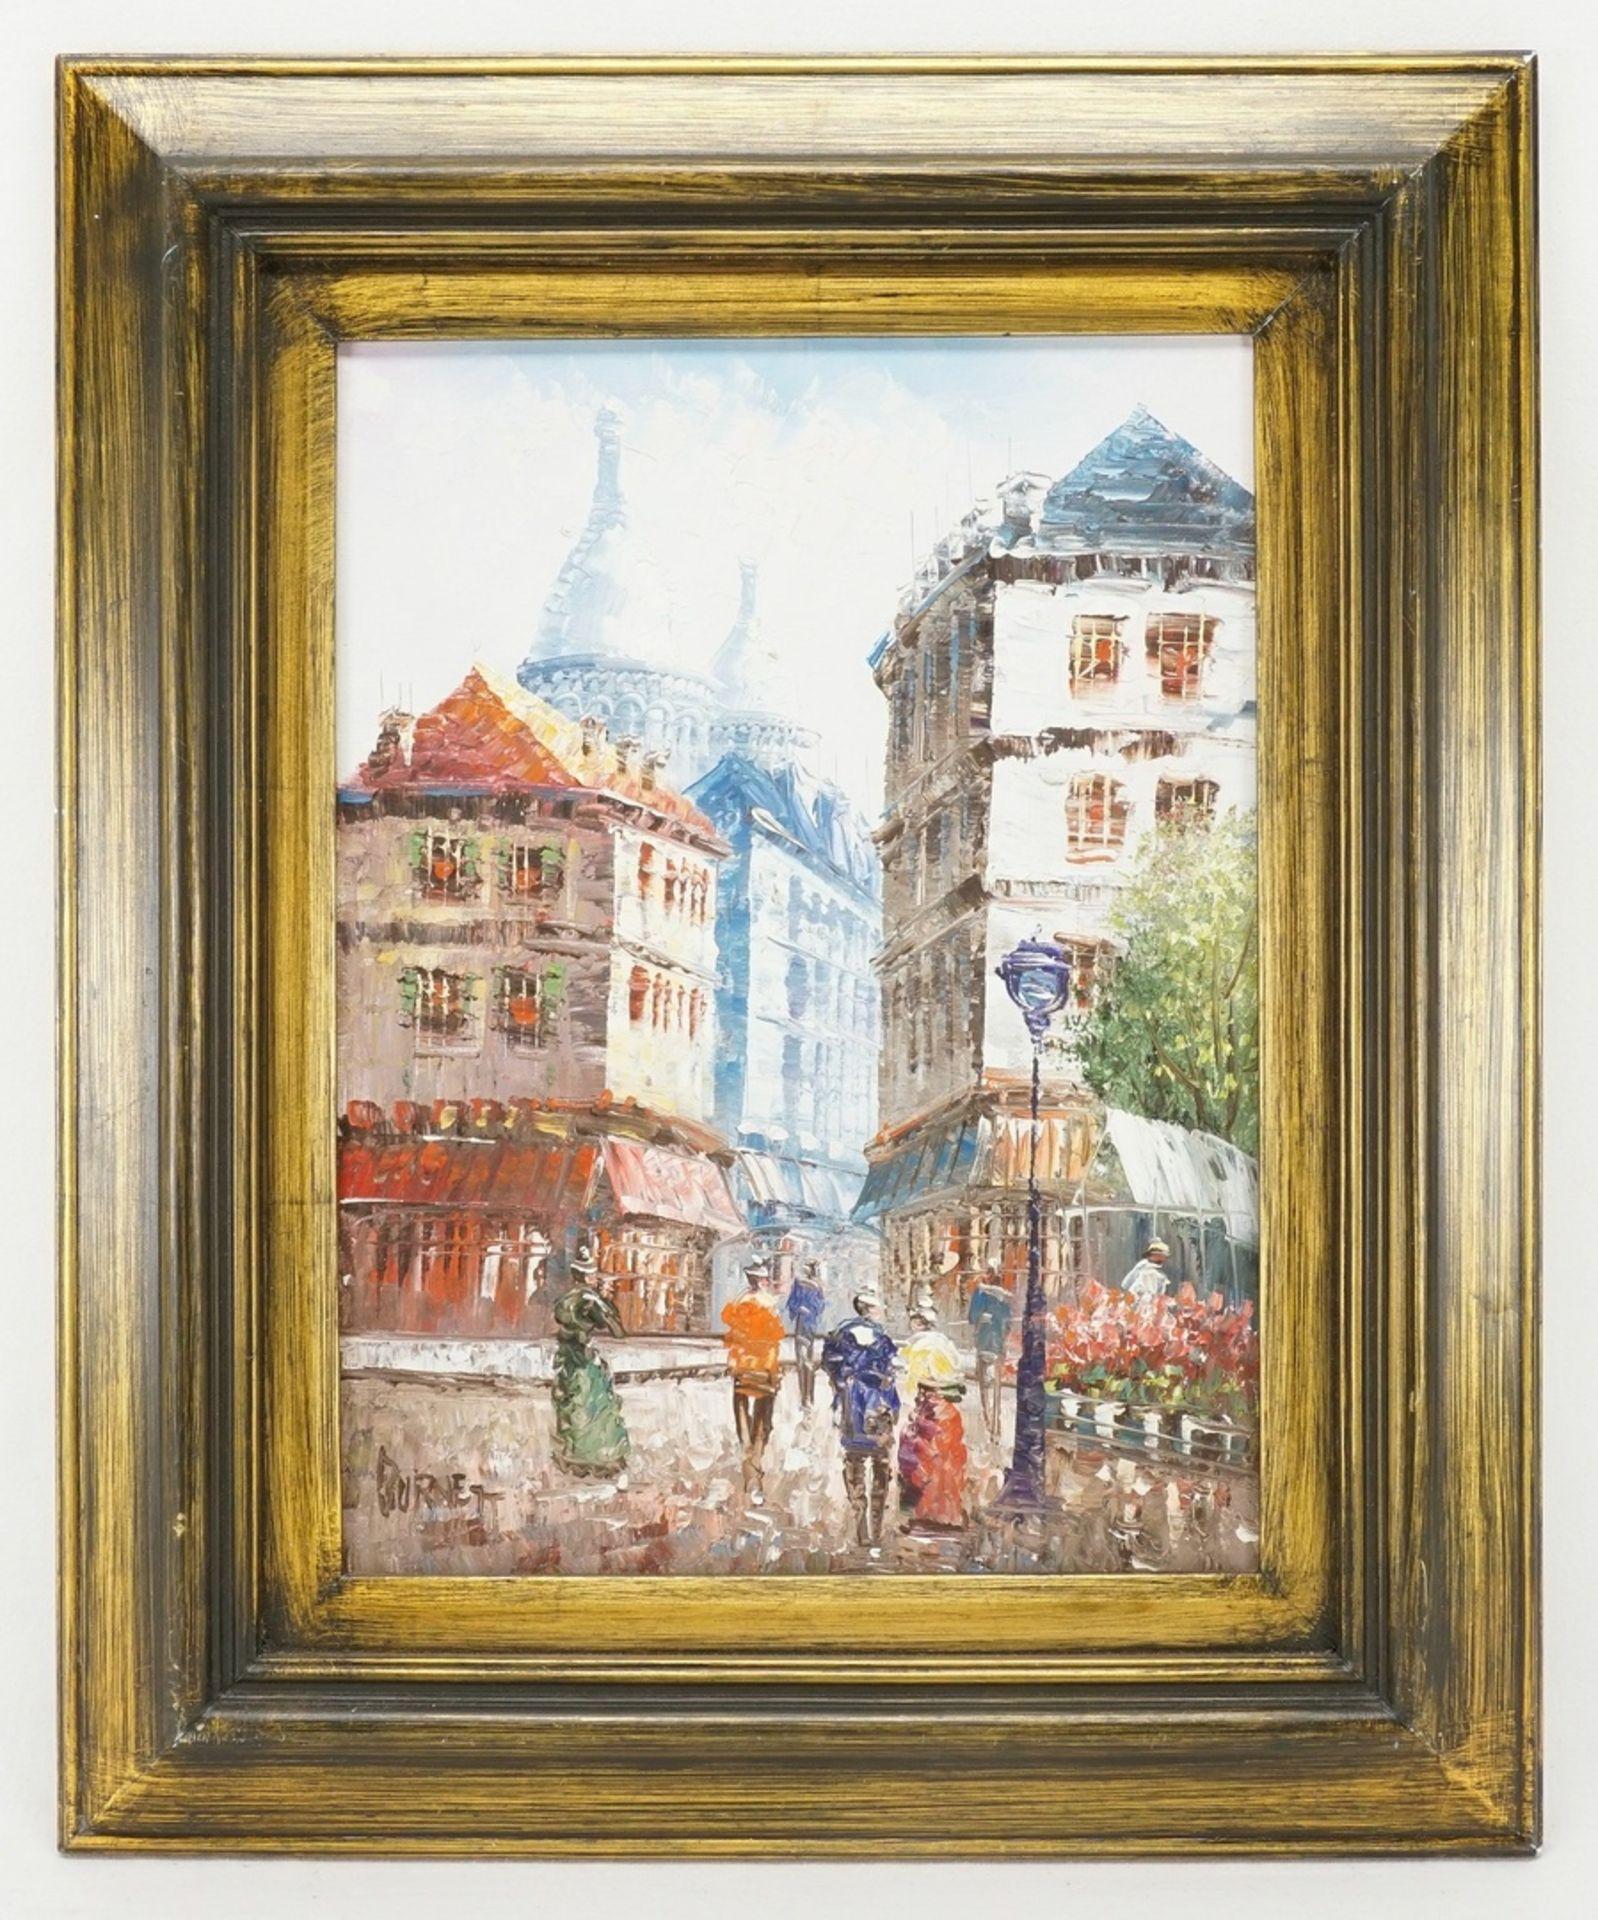 Burnett, Paris - am Montmartre - Bild 2 aus 4